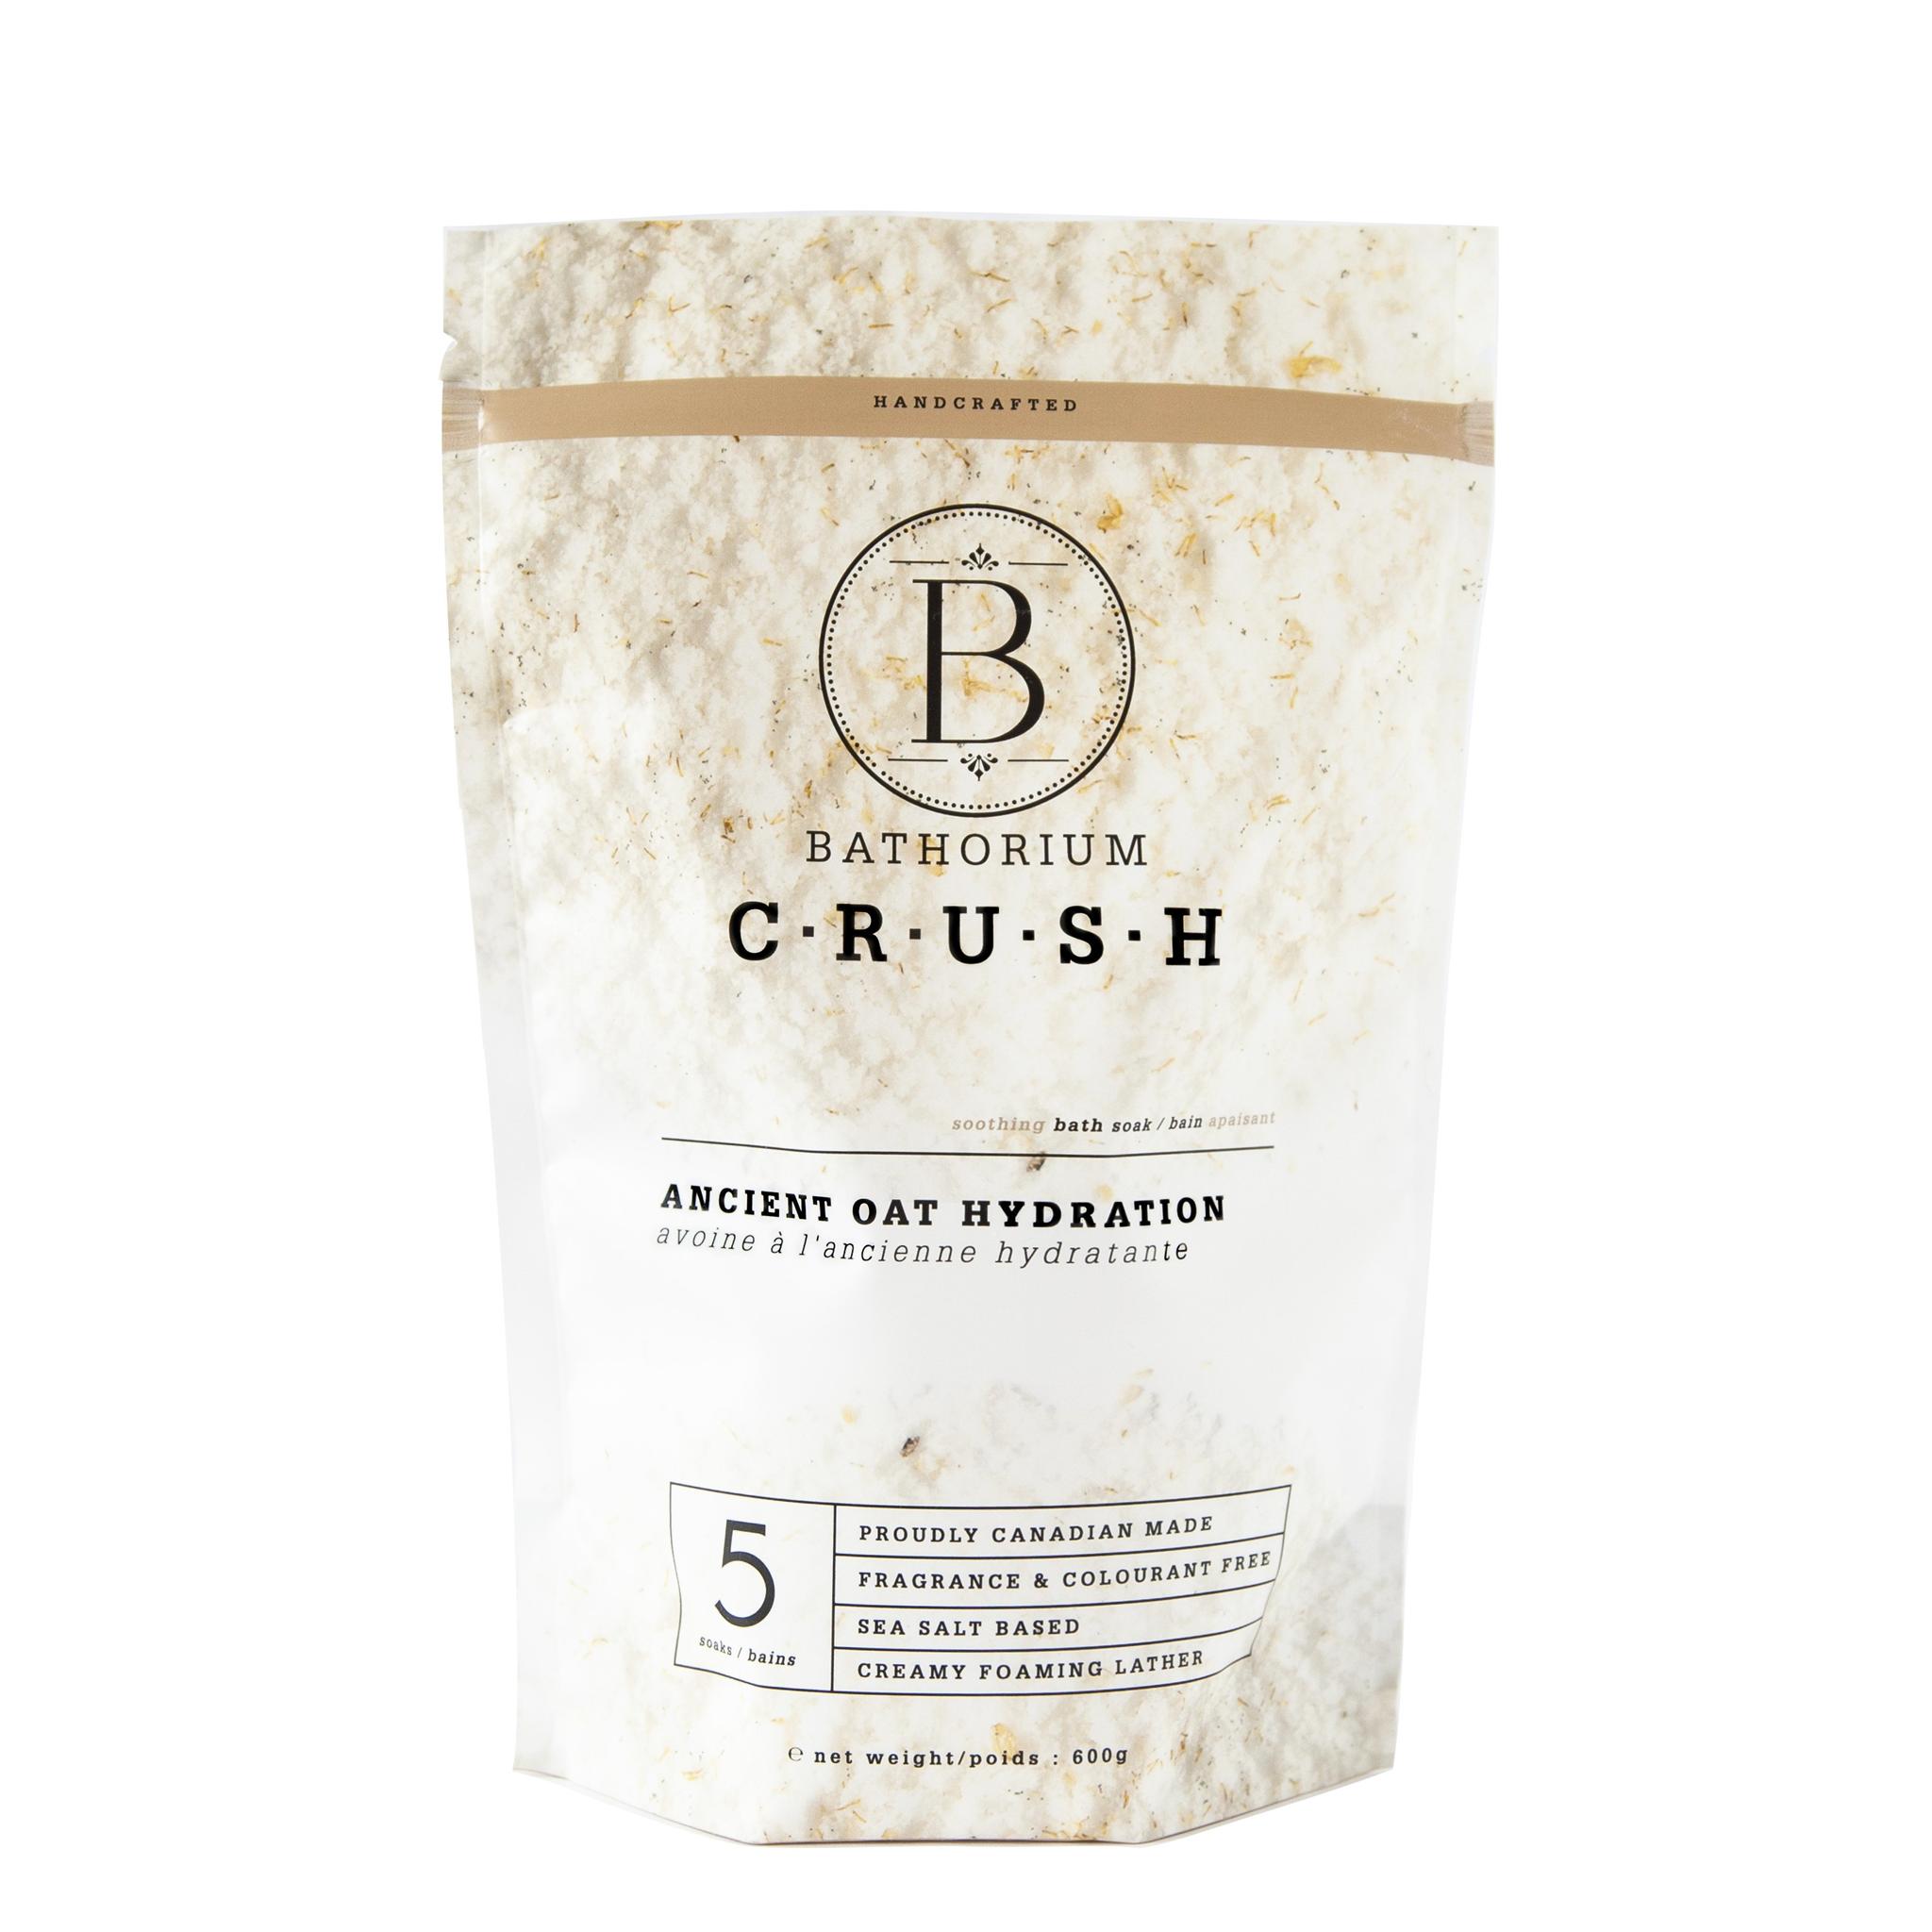 Bathorium Crush Ancient Oat Hydration